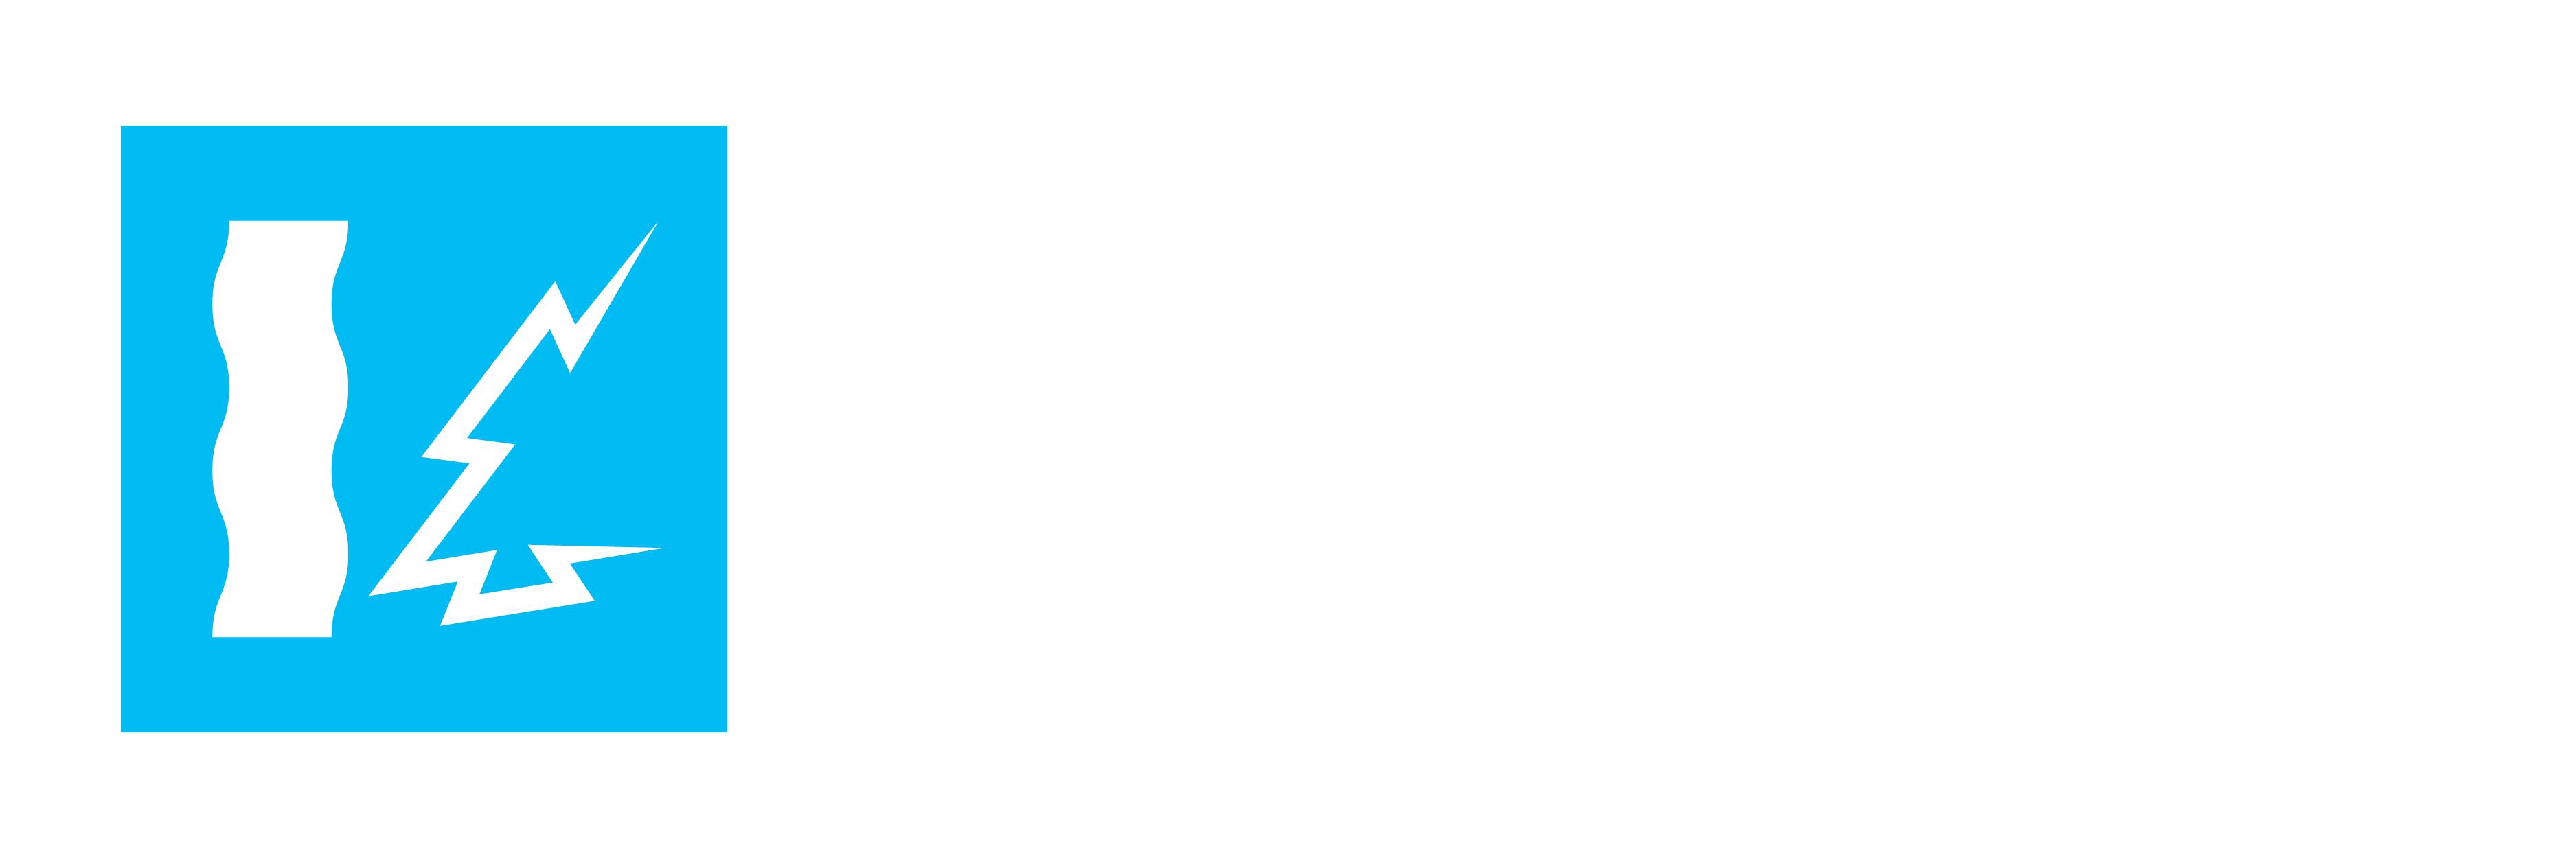 Notodden Energi